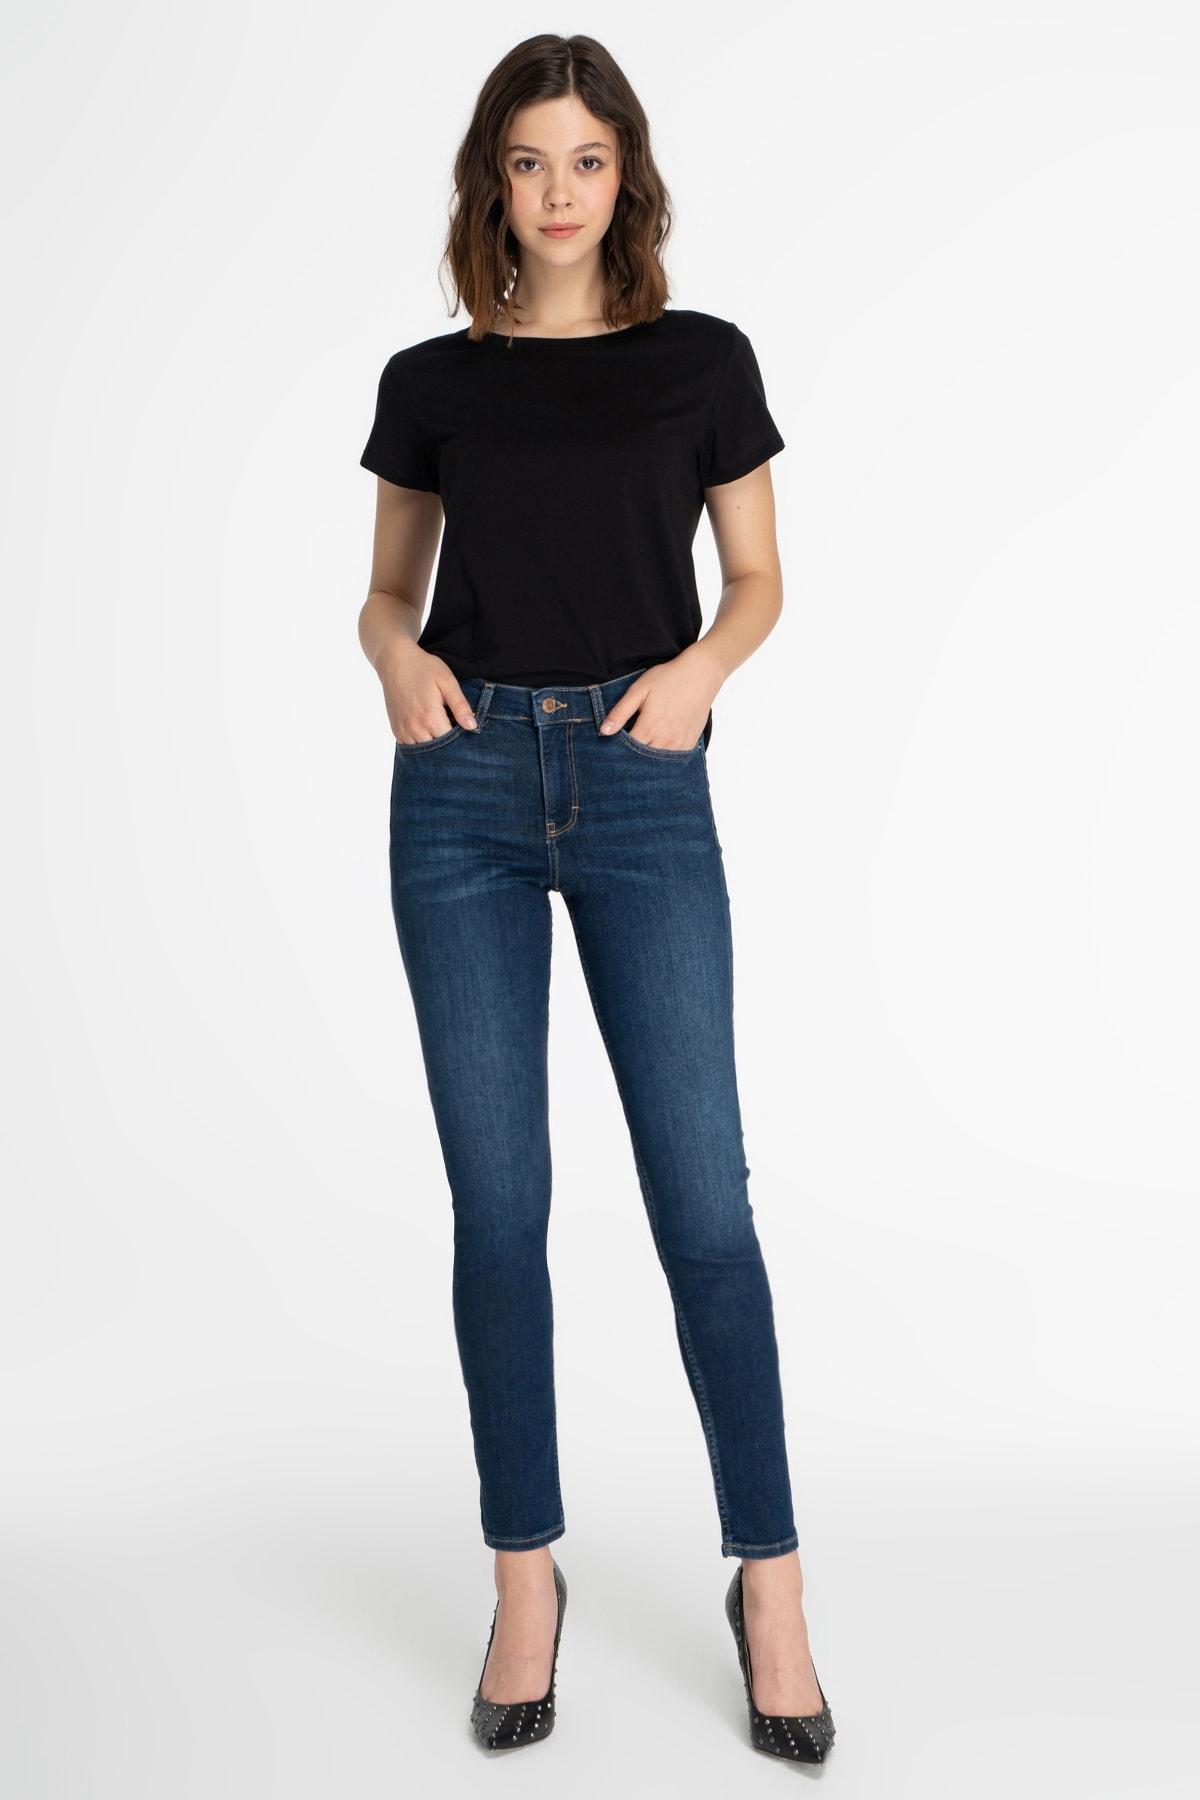 CROSS JEANS Kadın Koyu Mavi Normal Bel Skinny Fit Jean Pantolon 1